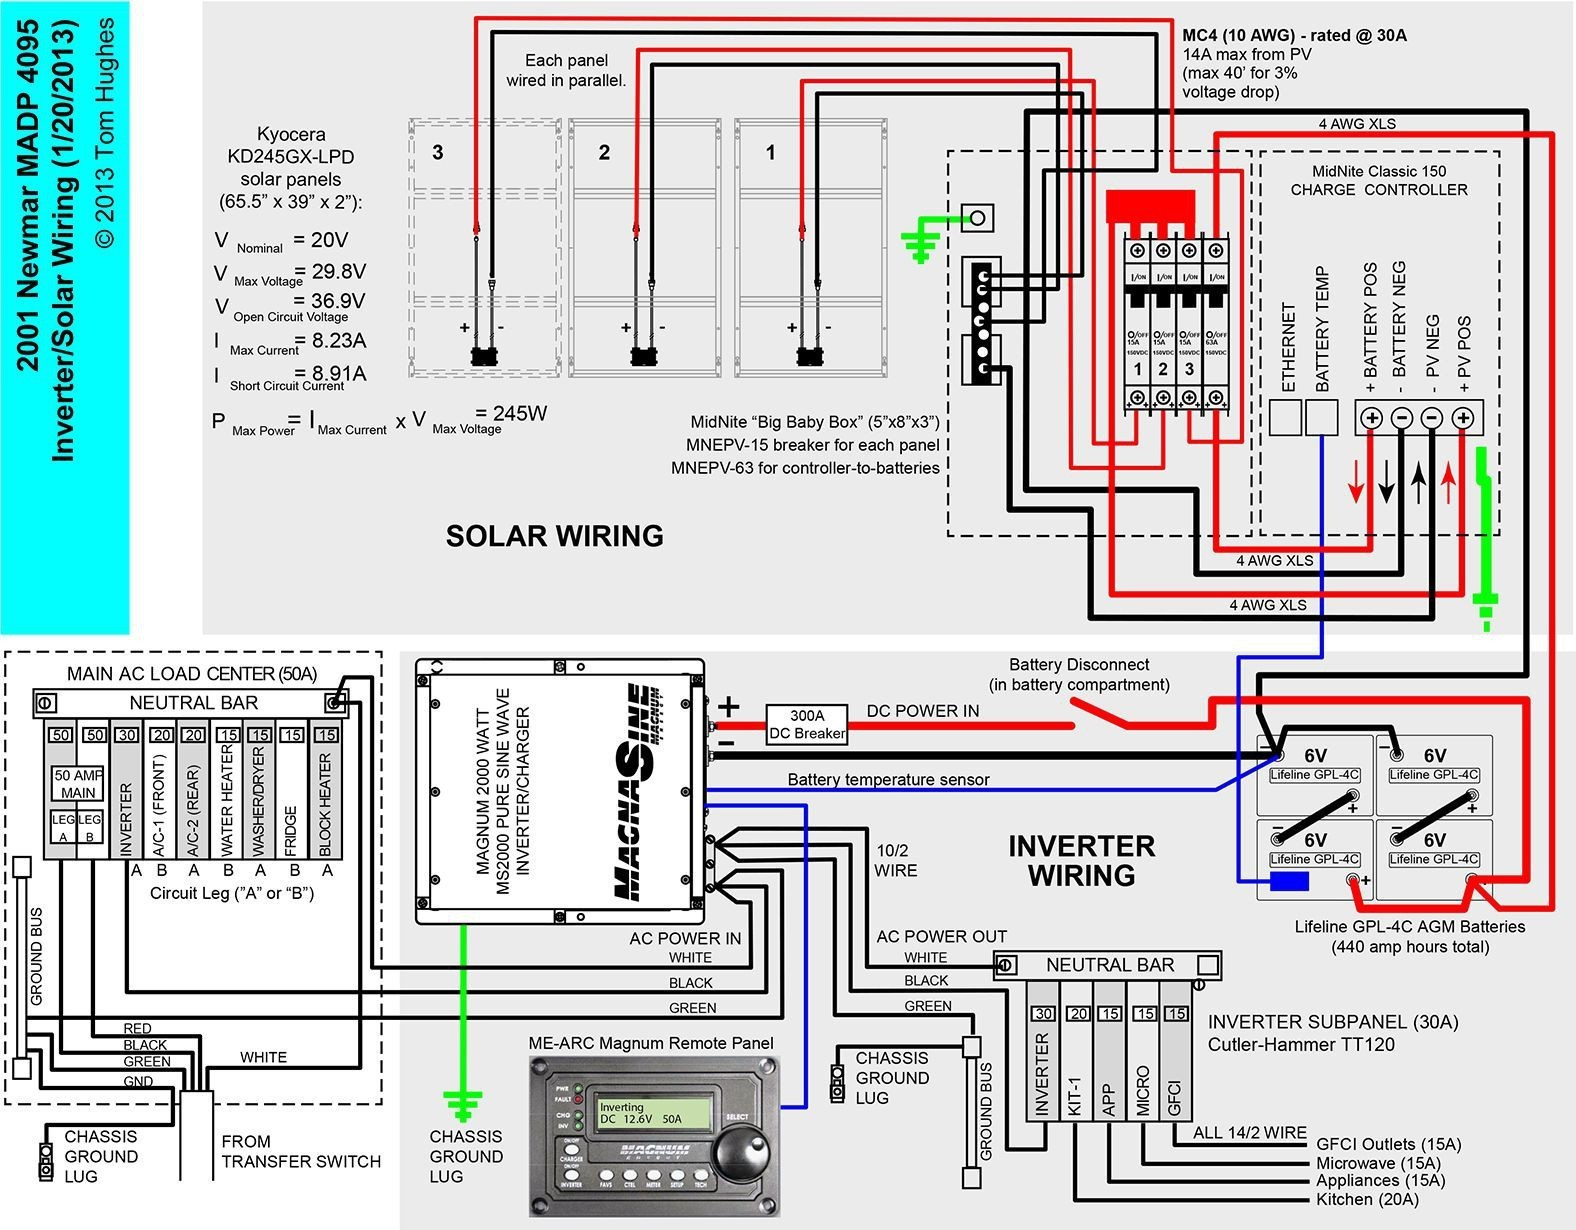 Solar System Wiring Diagram Sample Pdf Rv solar Wiring Diagram Vintage Rv  Converter Wiring Diagram Wiring